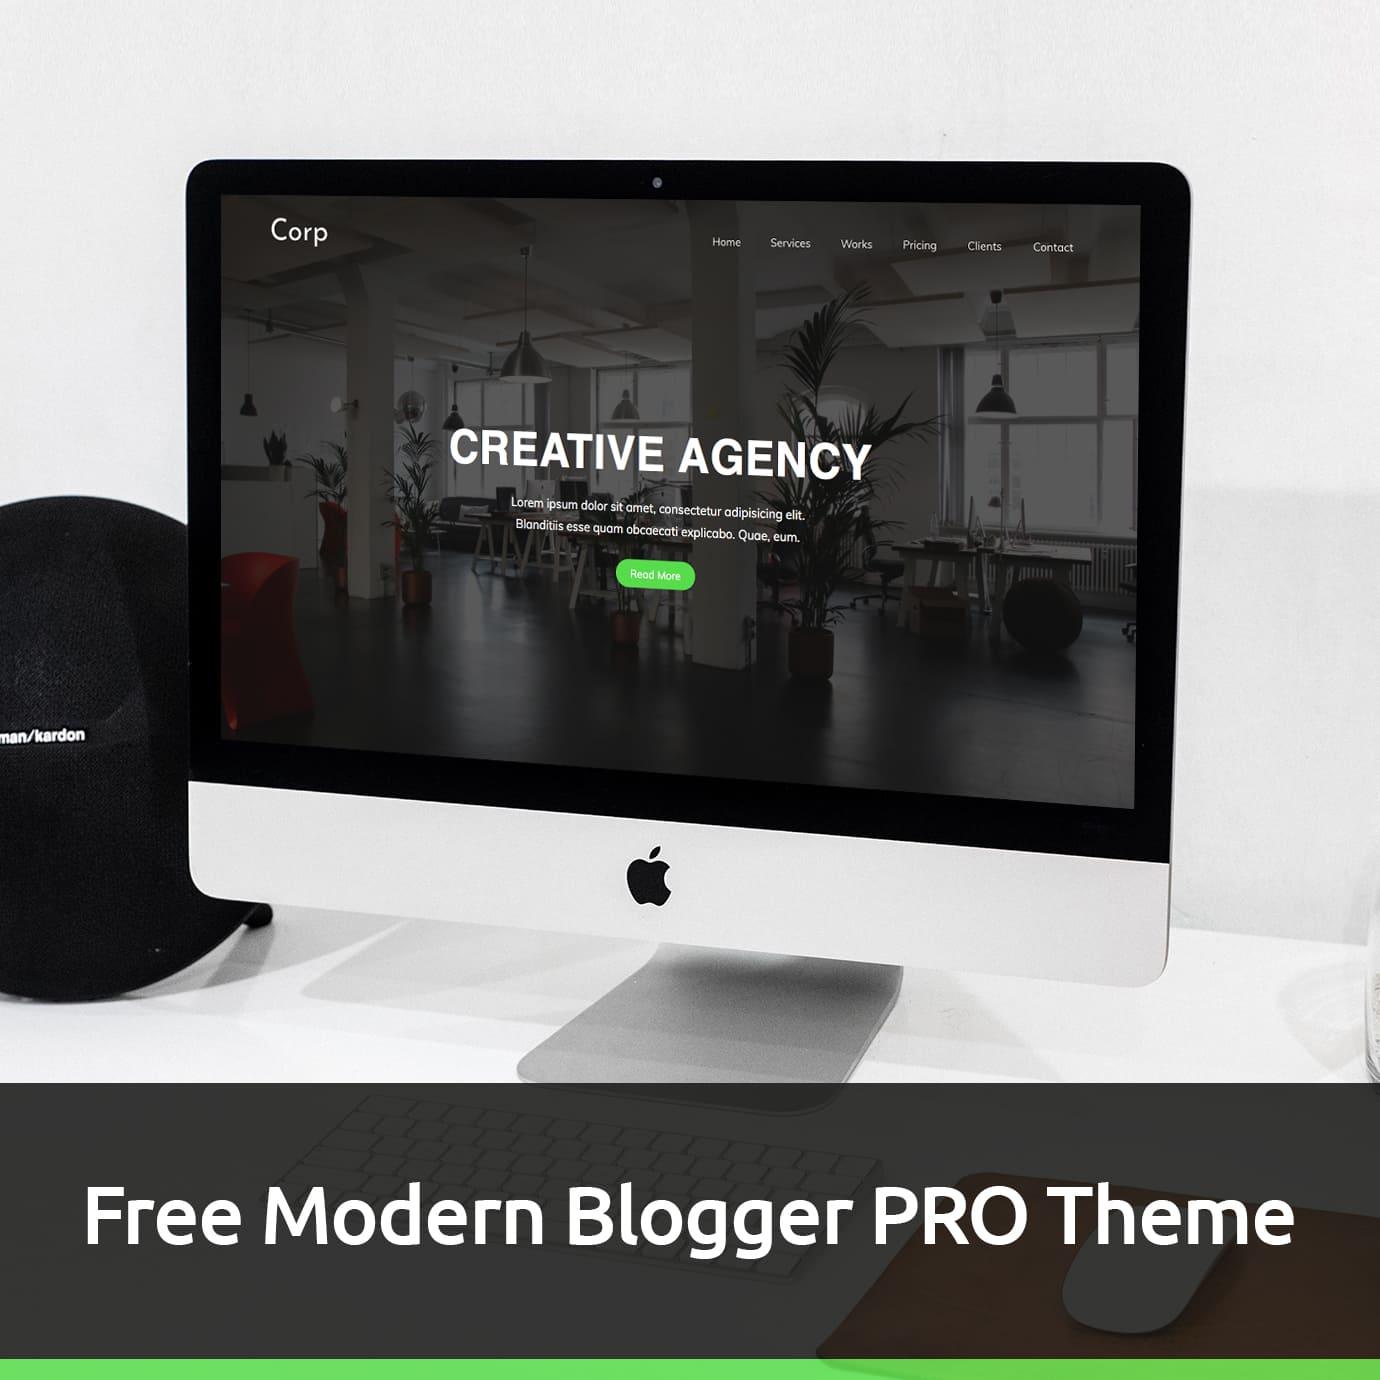 Free Modern Blogger PRO Theme.